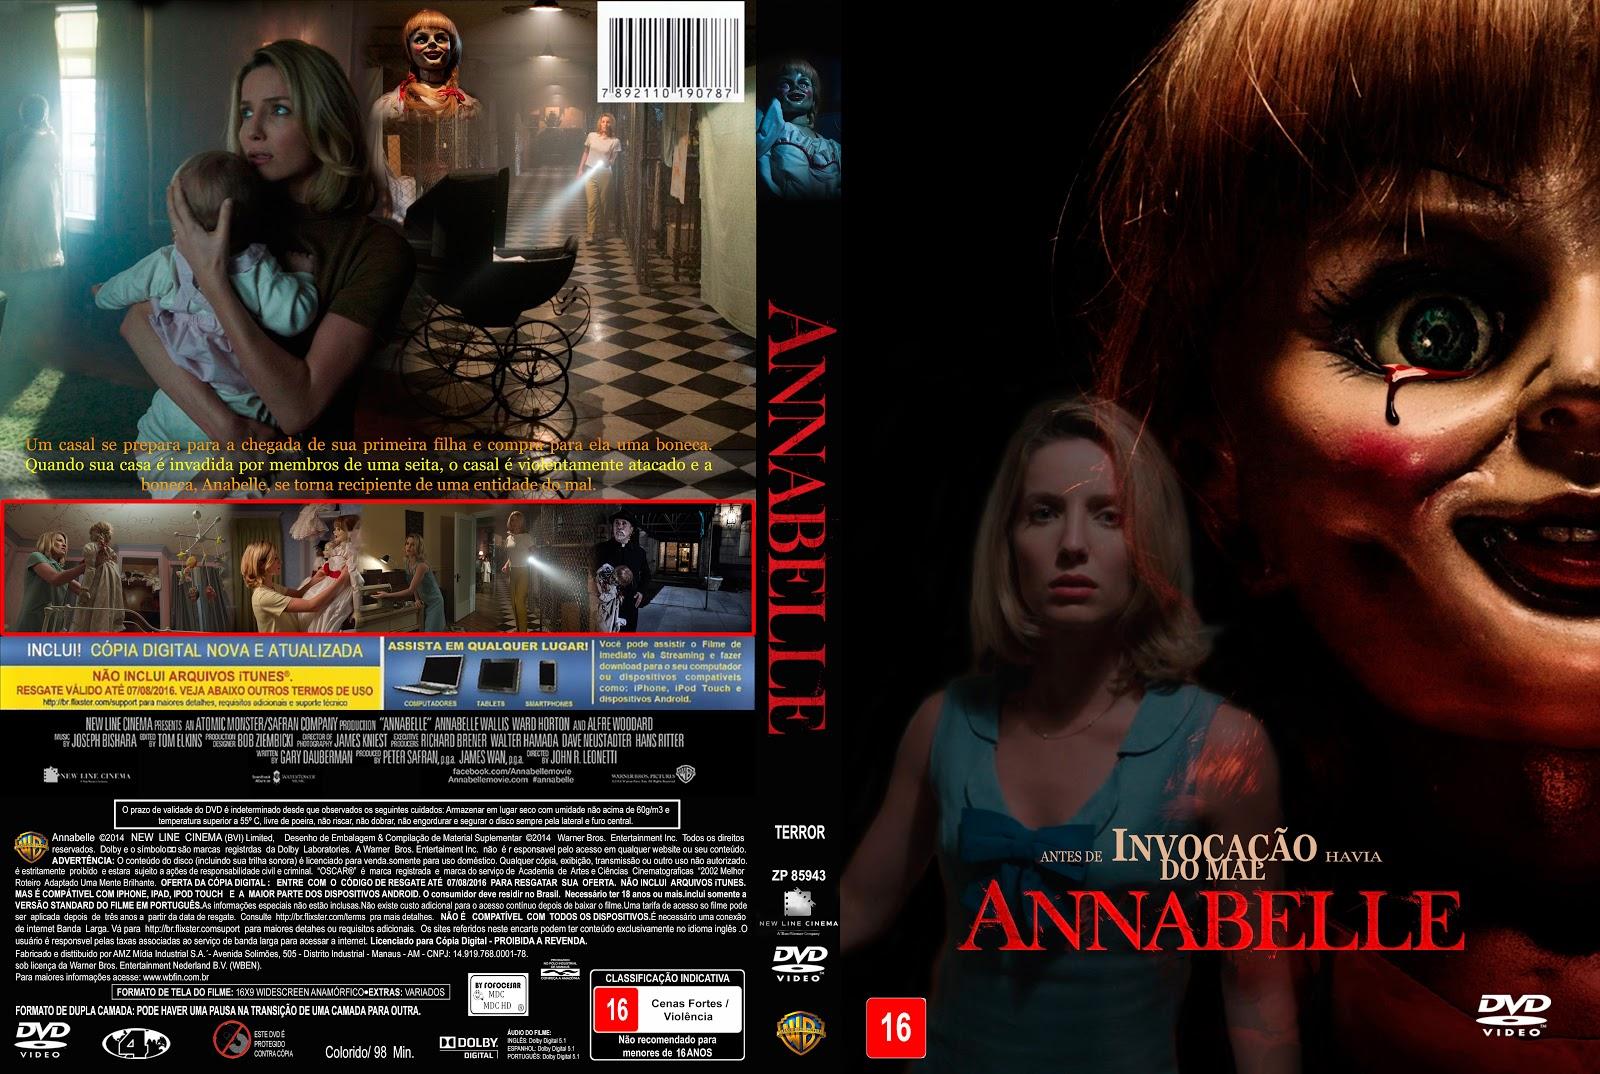 Capa DVD Annabelle